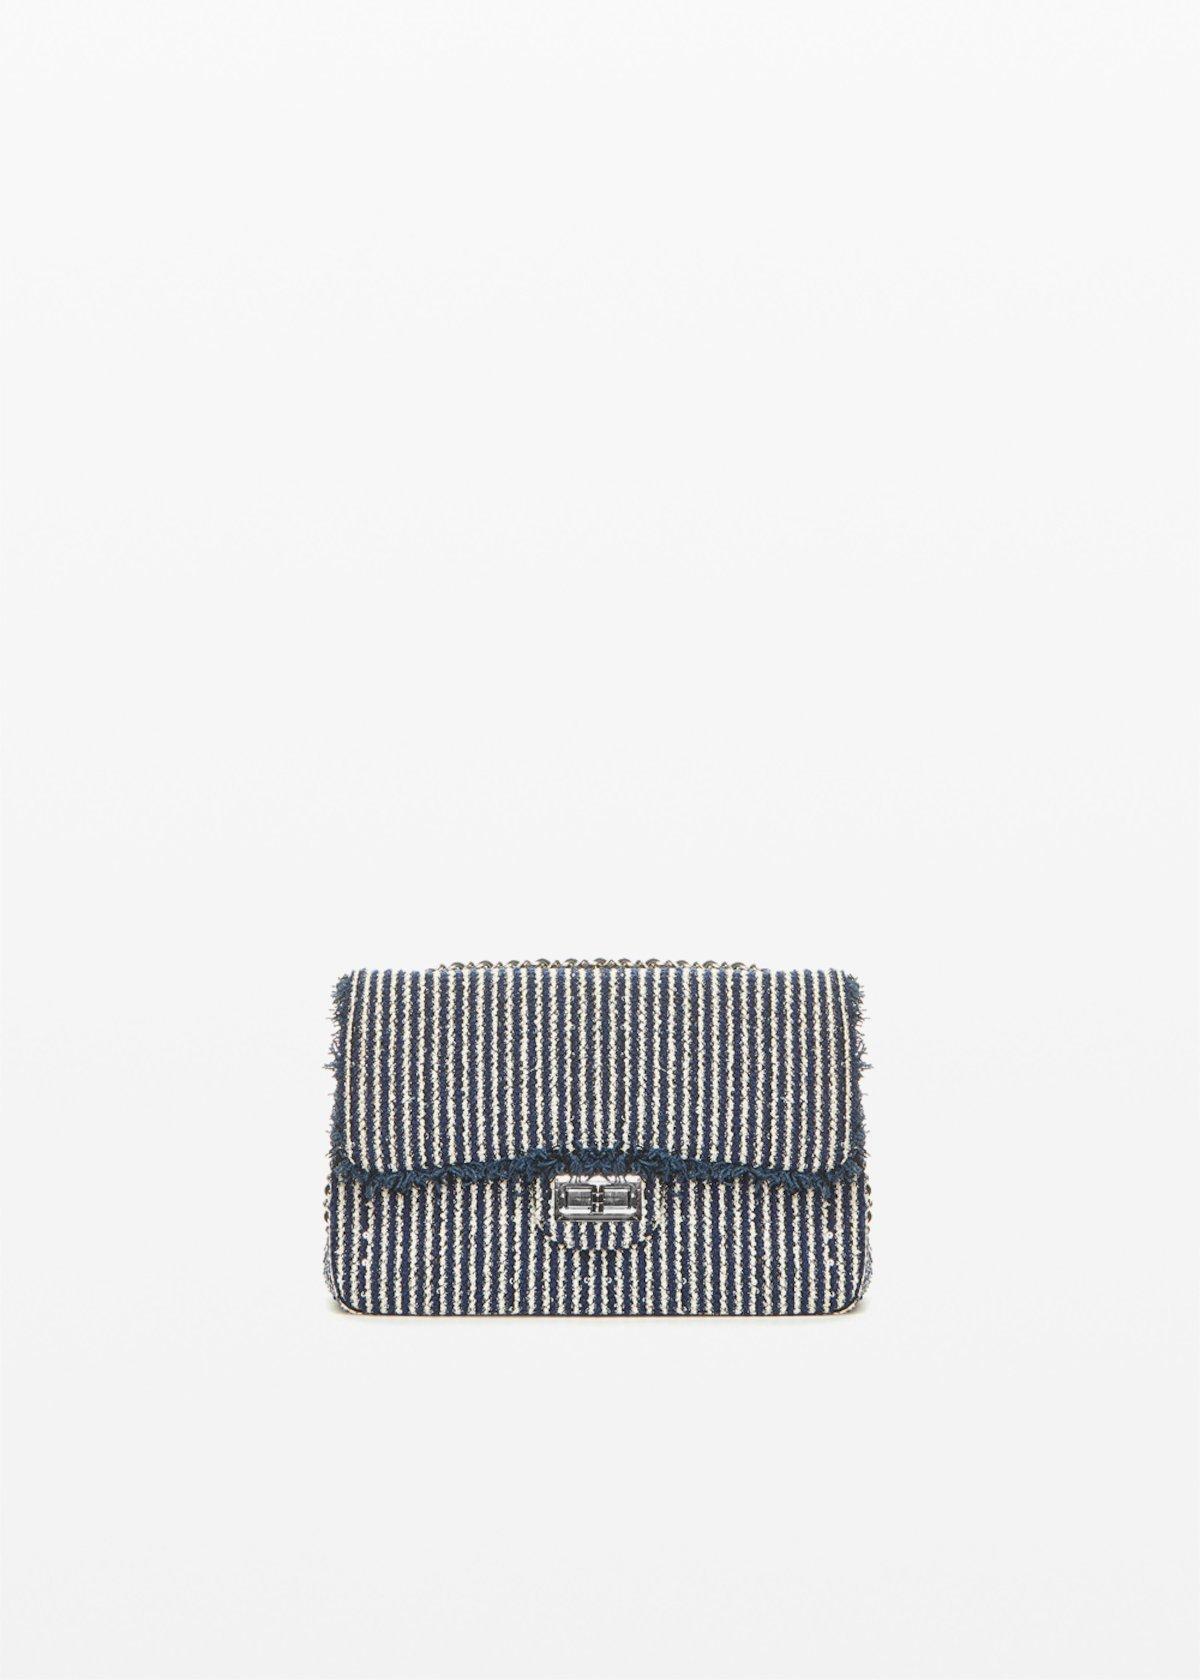 Giadastri semi rigid clutch - Blue / White Stripes - Woman - Category image